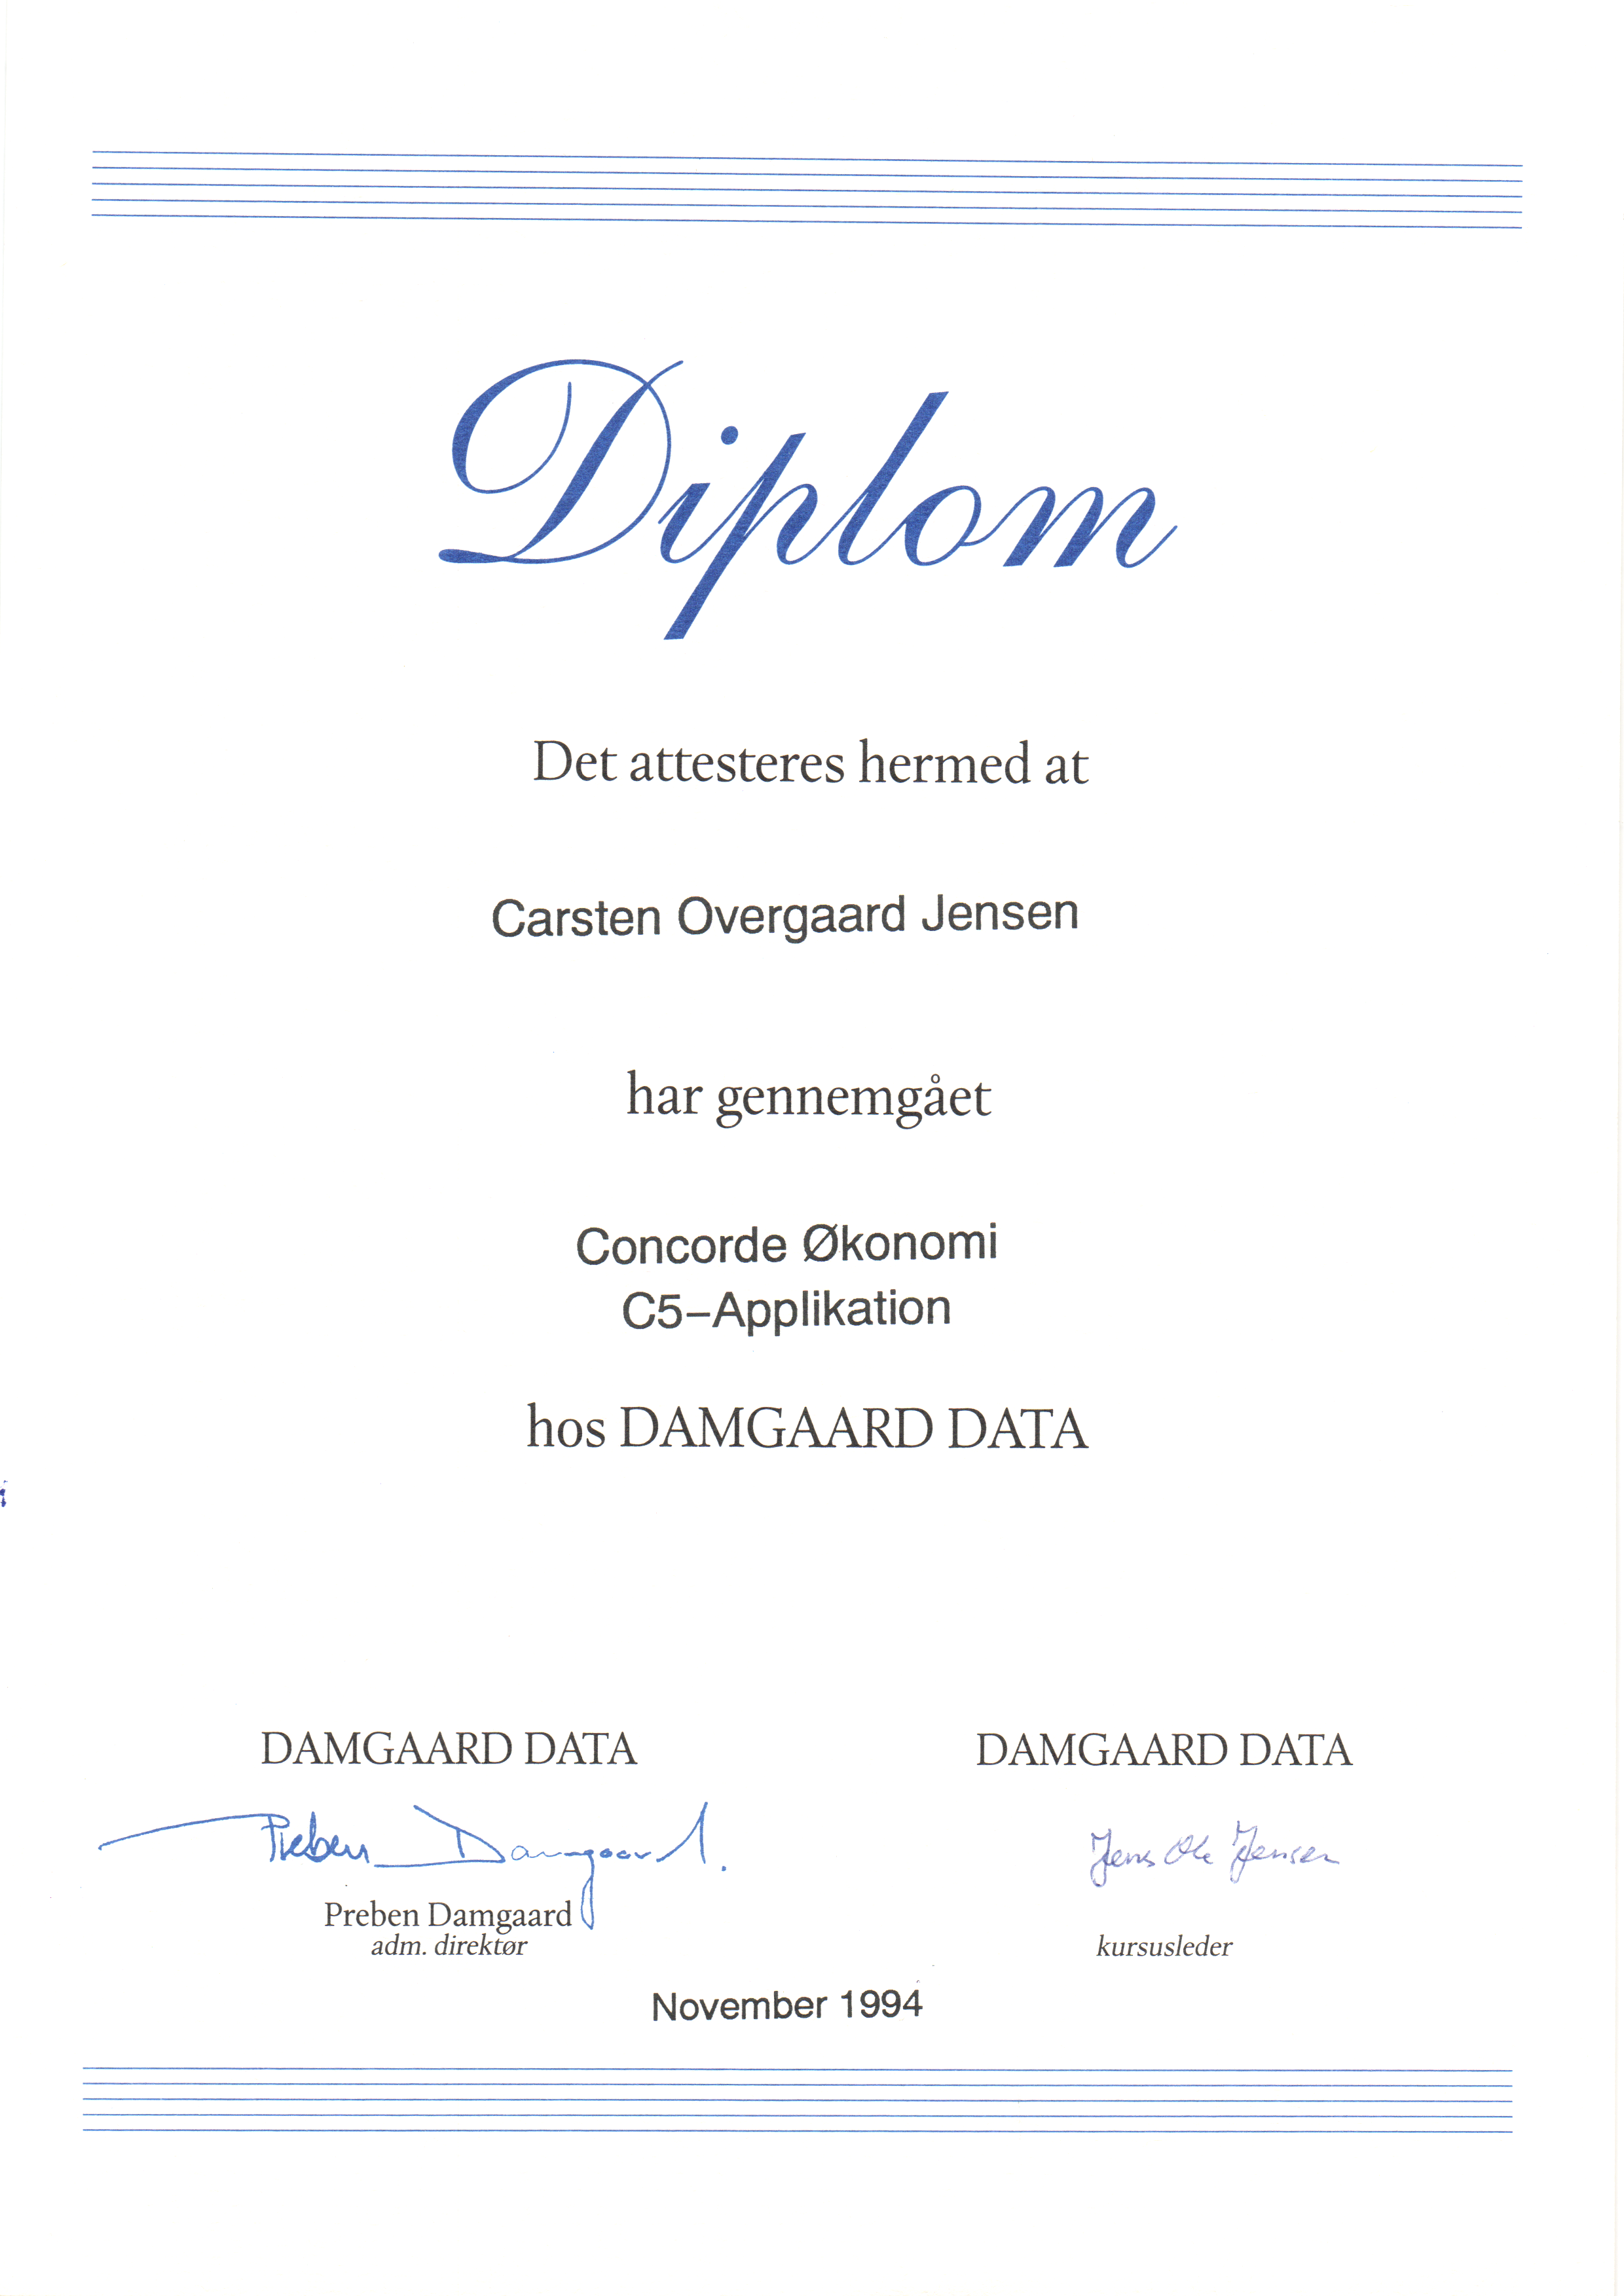 Kursus certifikat Concorde Økonomi C5-Applikation